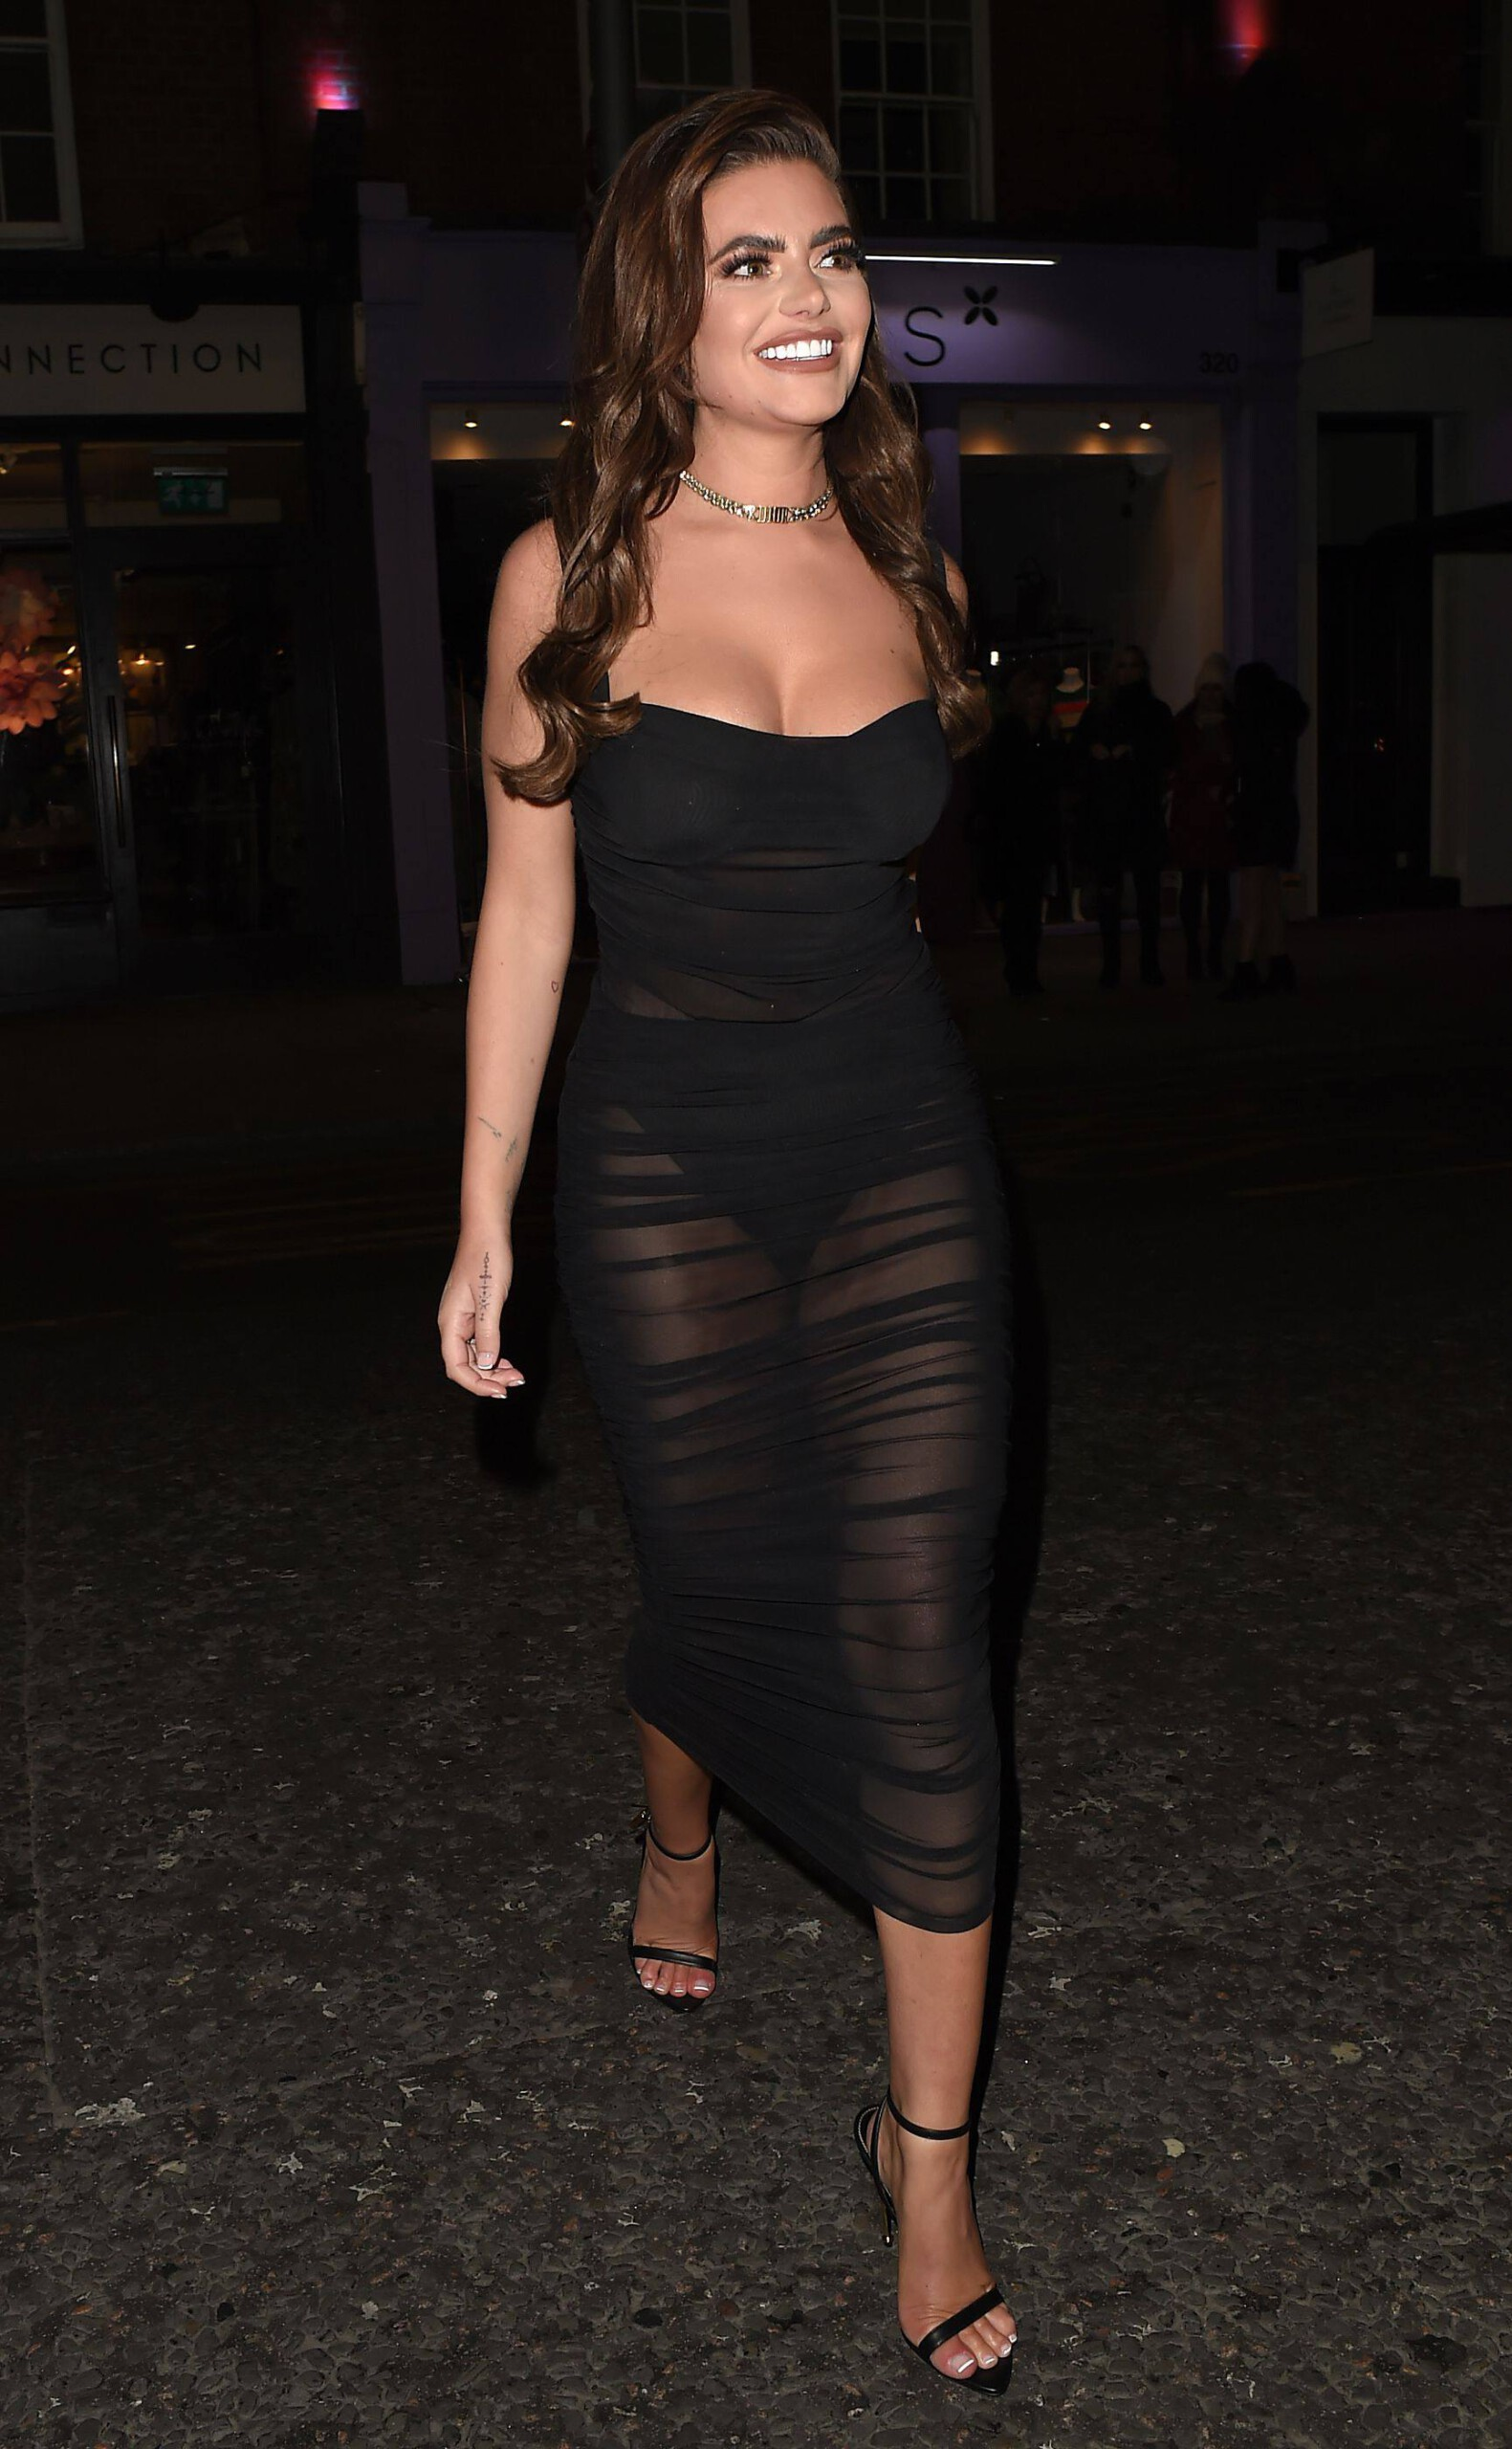 Megan Barton Hanson Sexy Sheer Black Dress